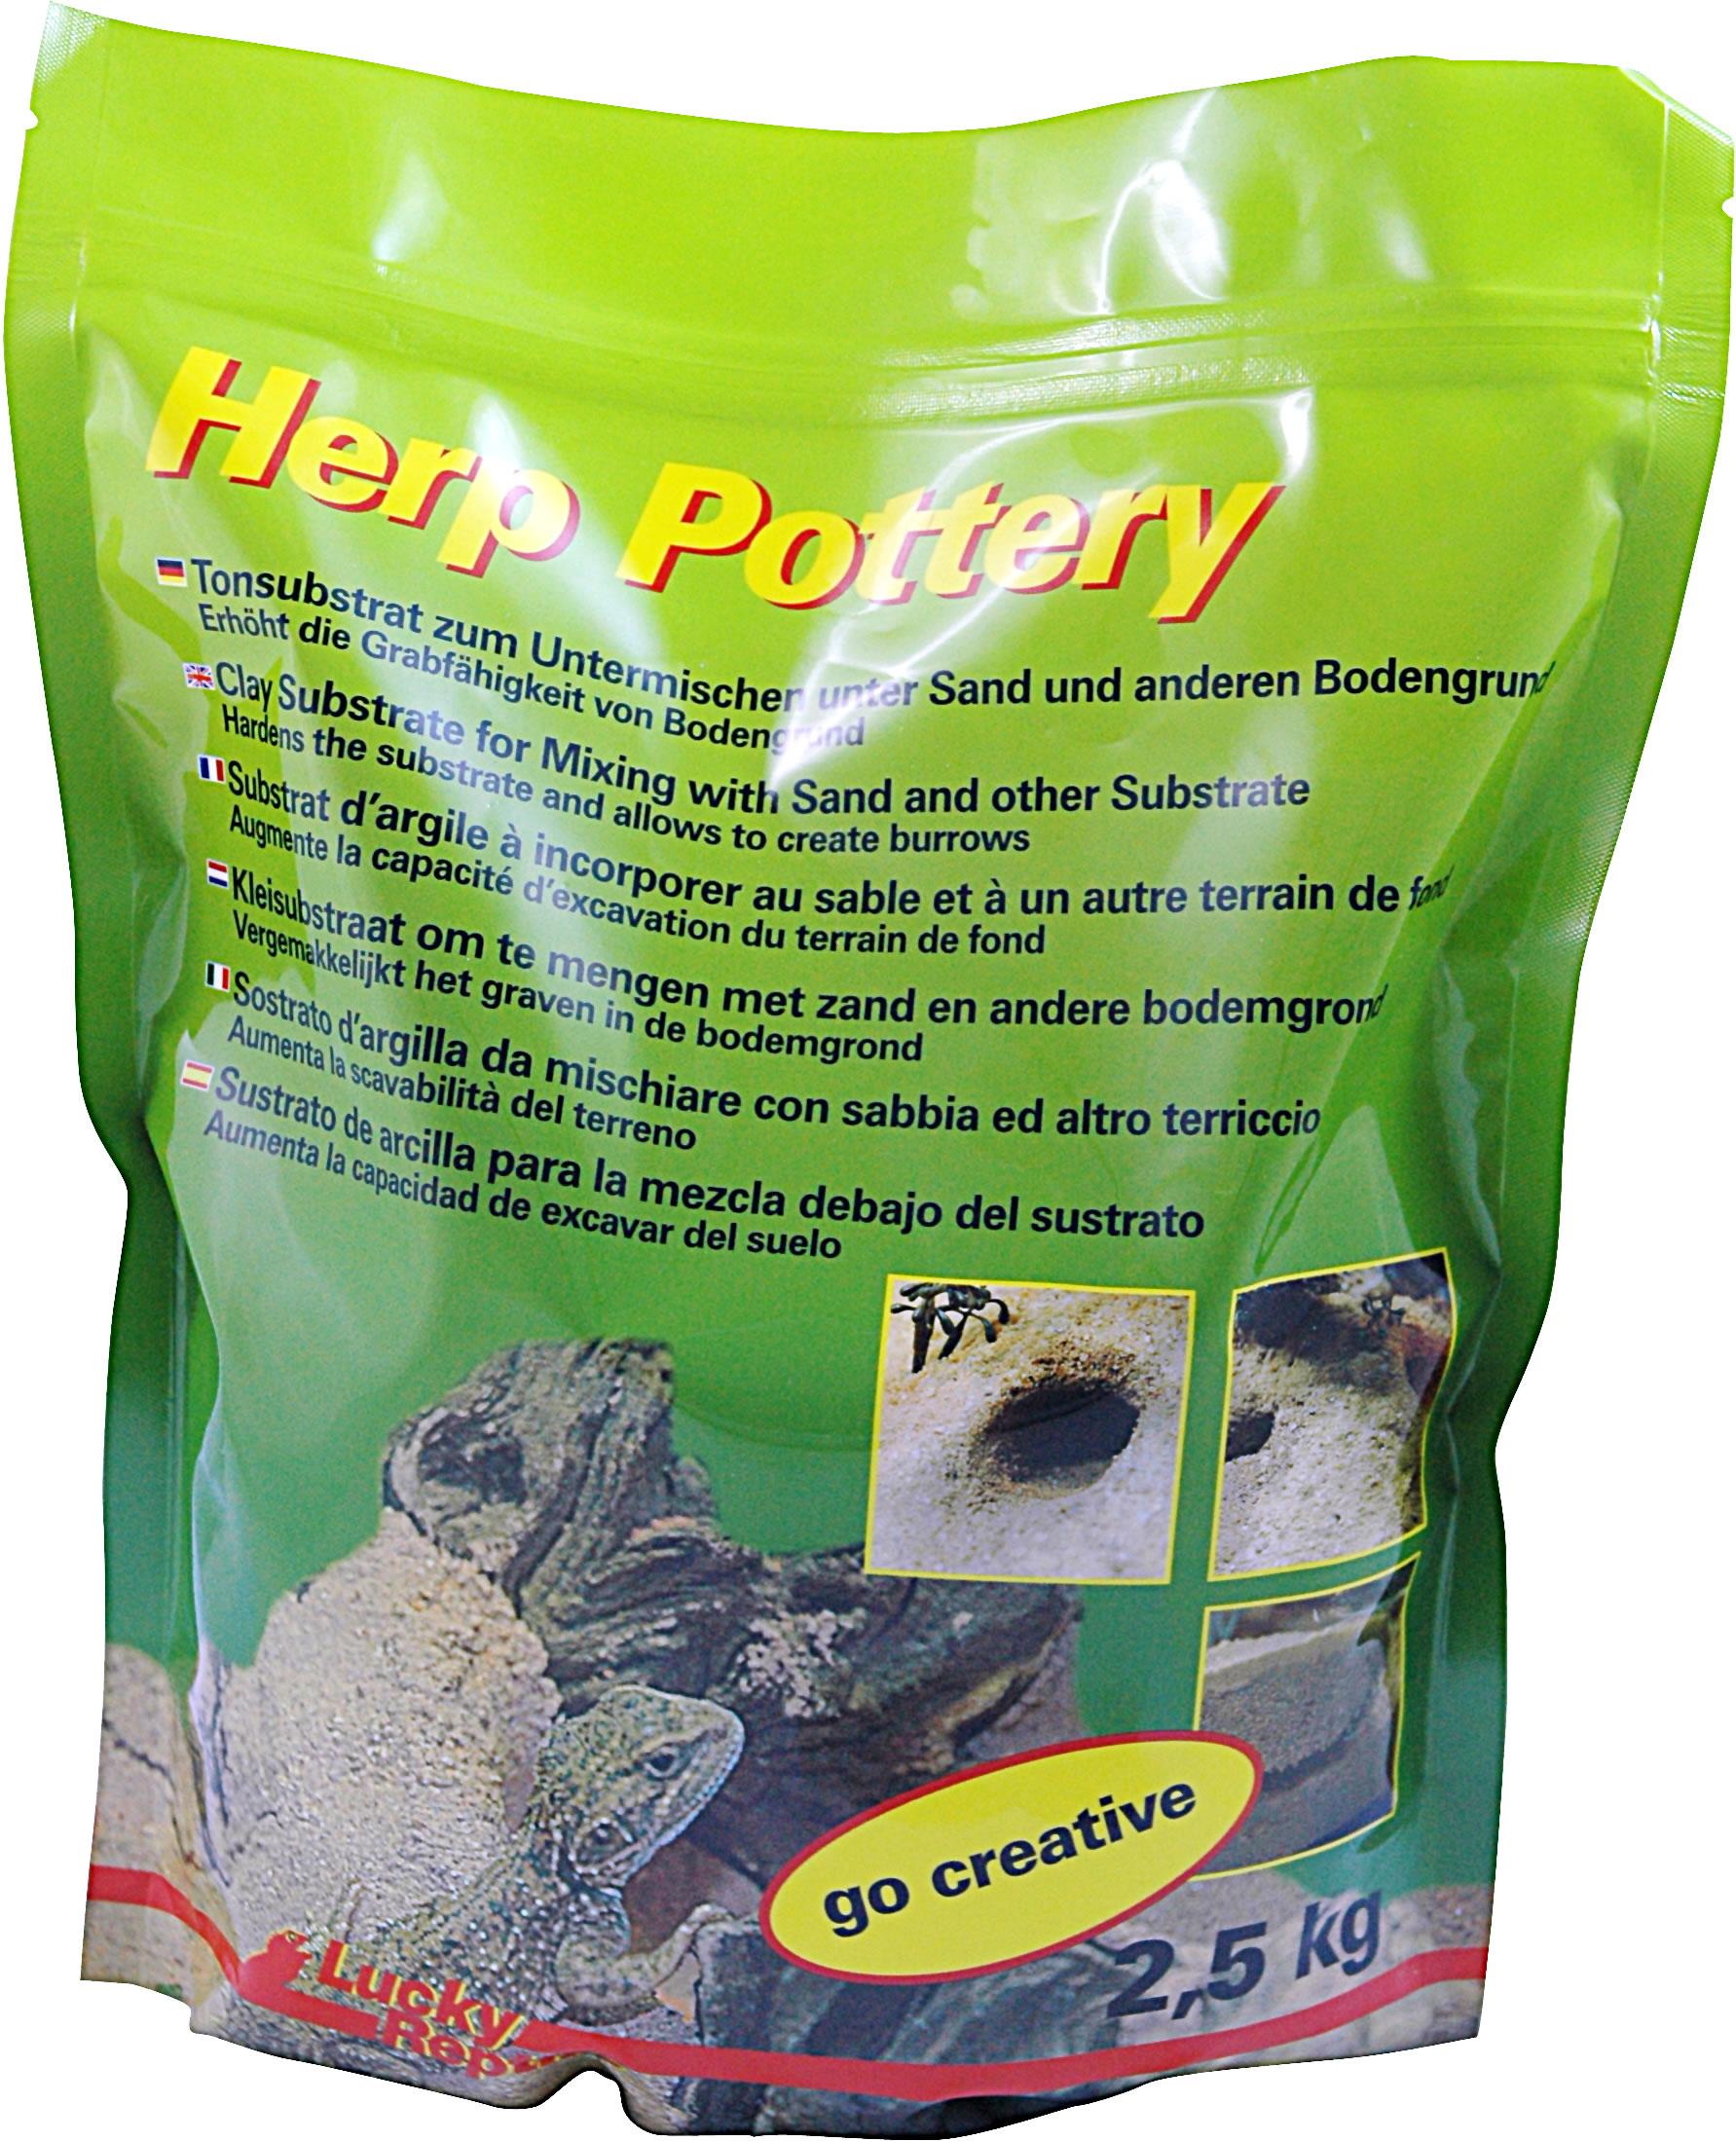 Lucky Reptile Herp Pottery Tongranulat - 2,5 kg